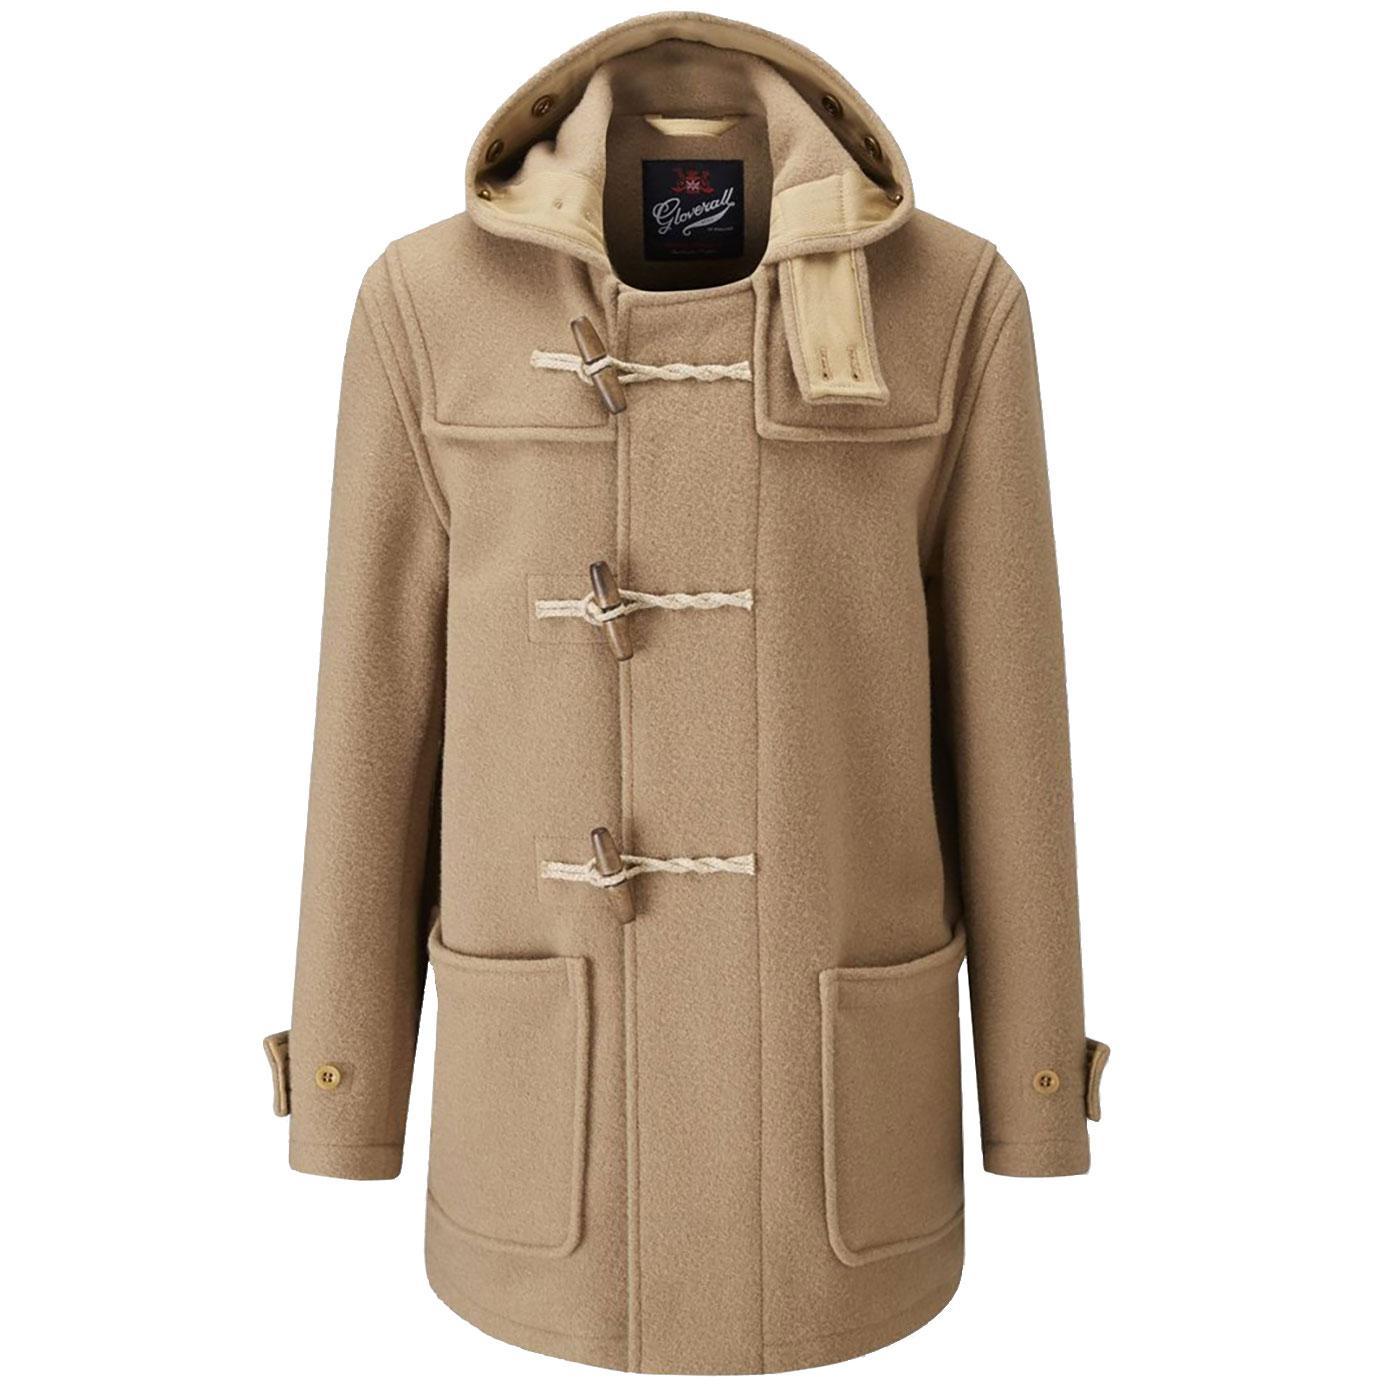 Mid Monty GLOVERALL Mod 60s Wool Duffle Coat (C)